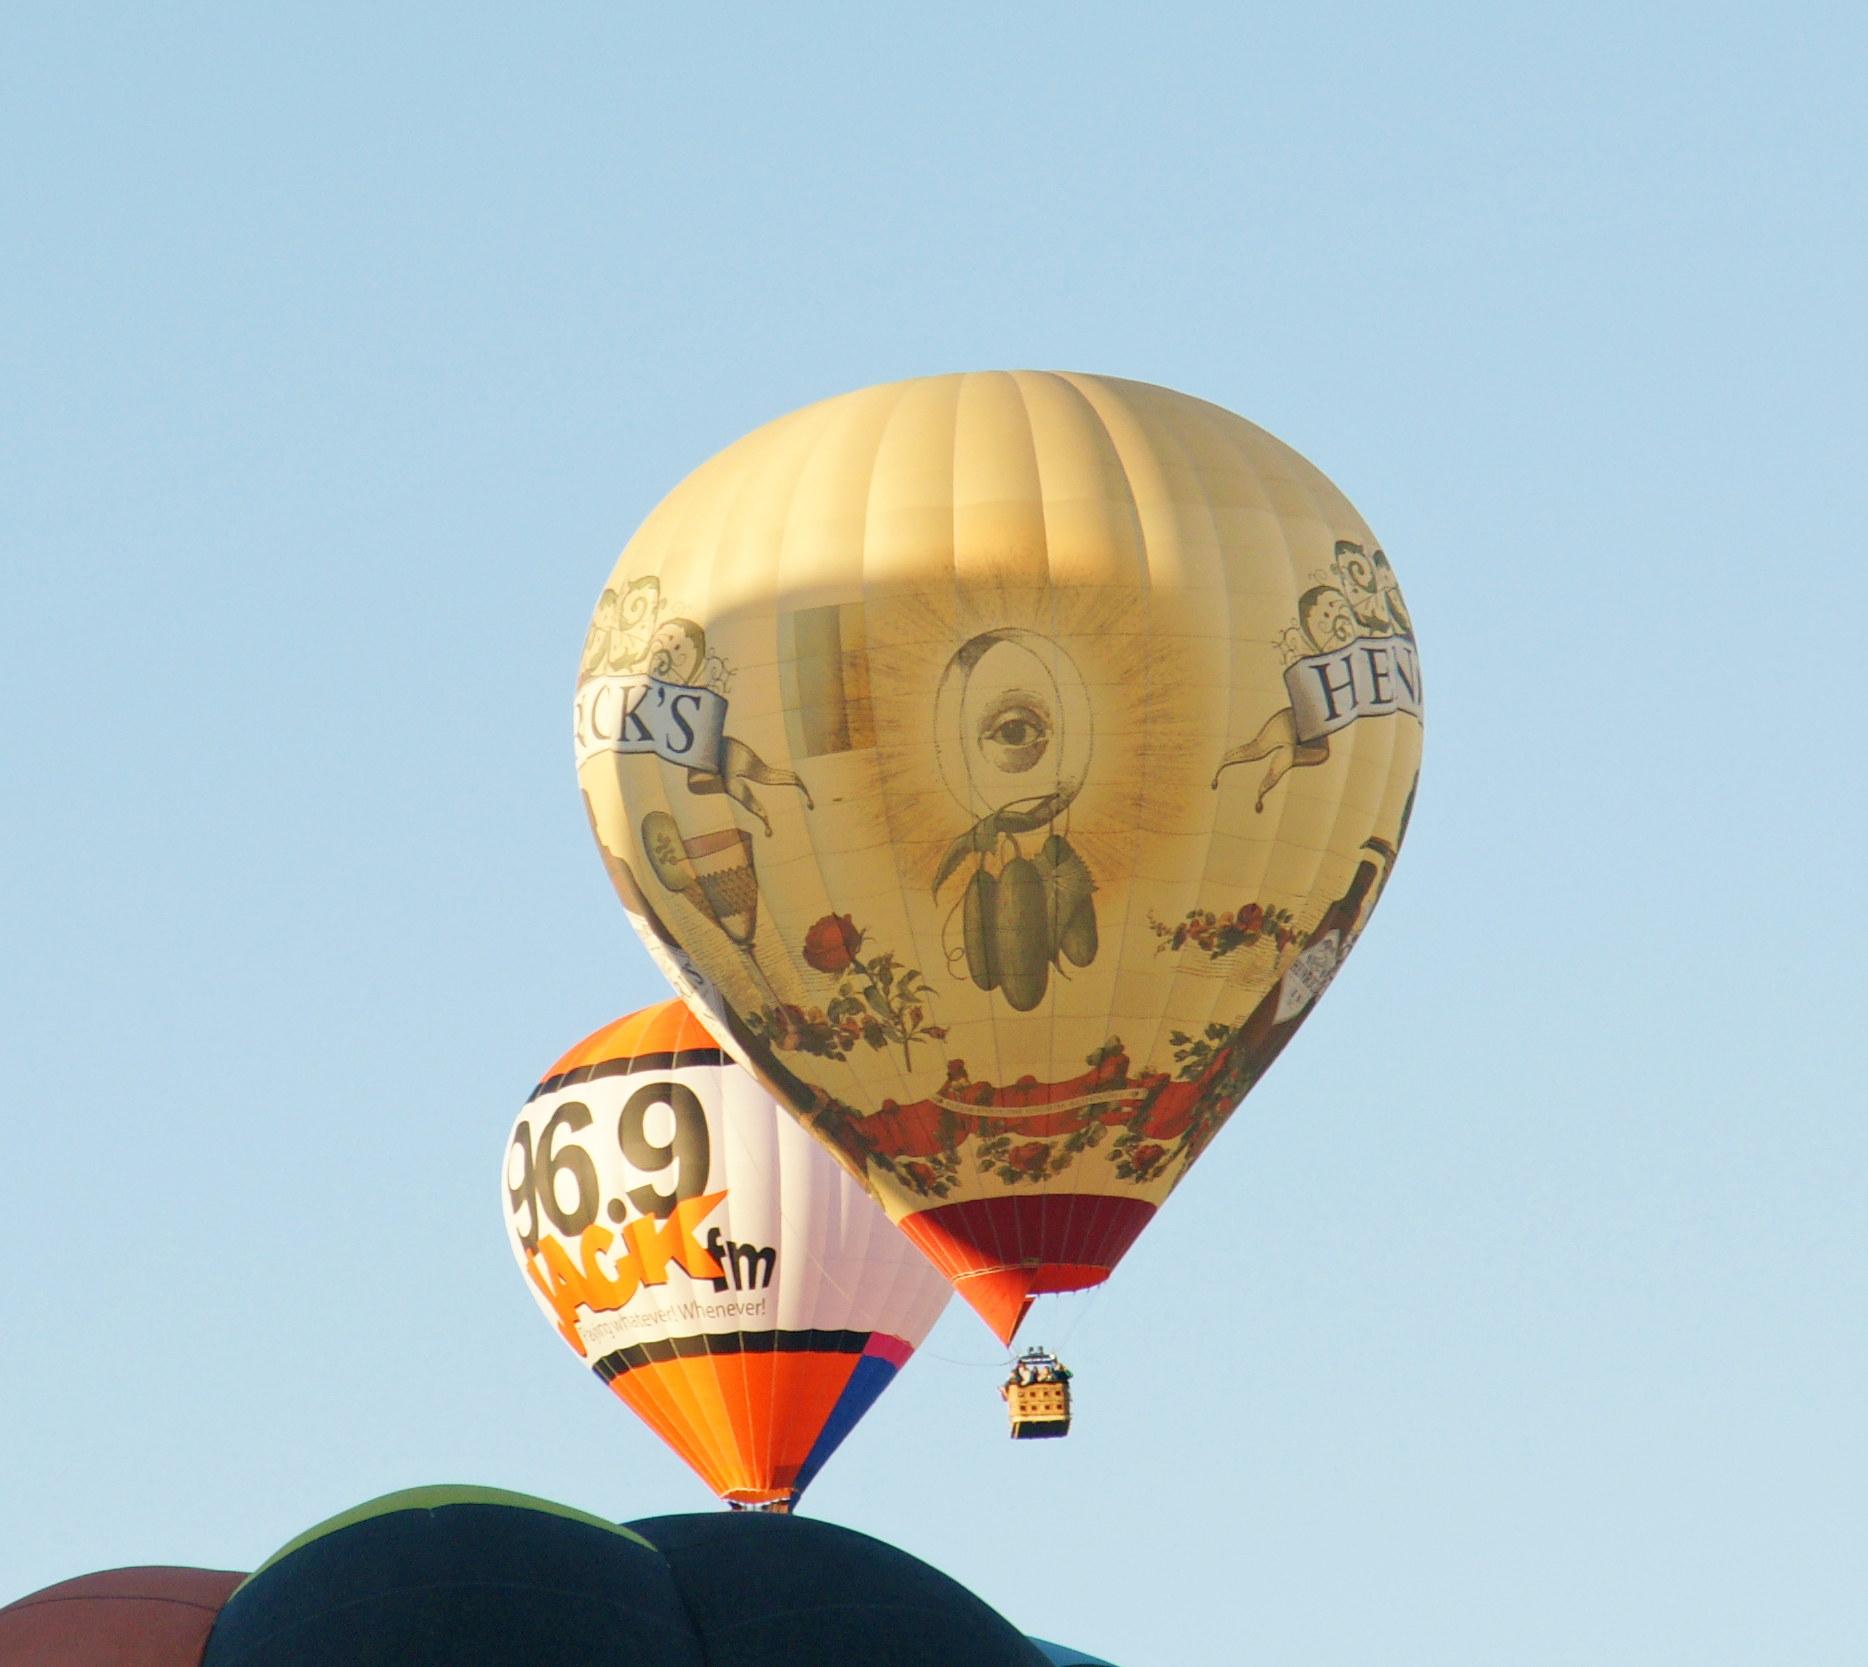 aibf-Single-Balloons-Gallery05